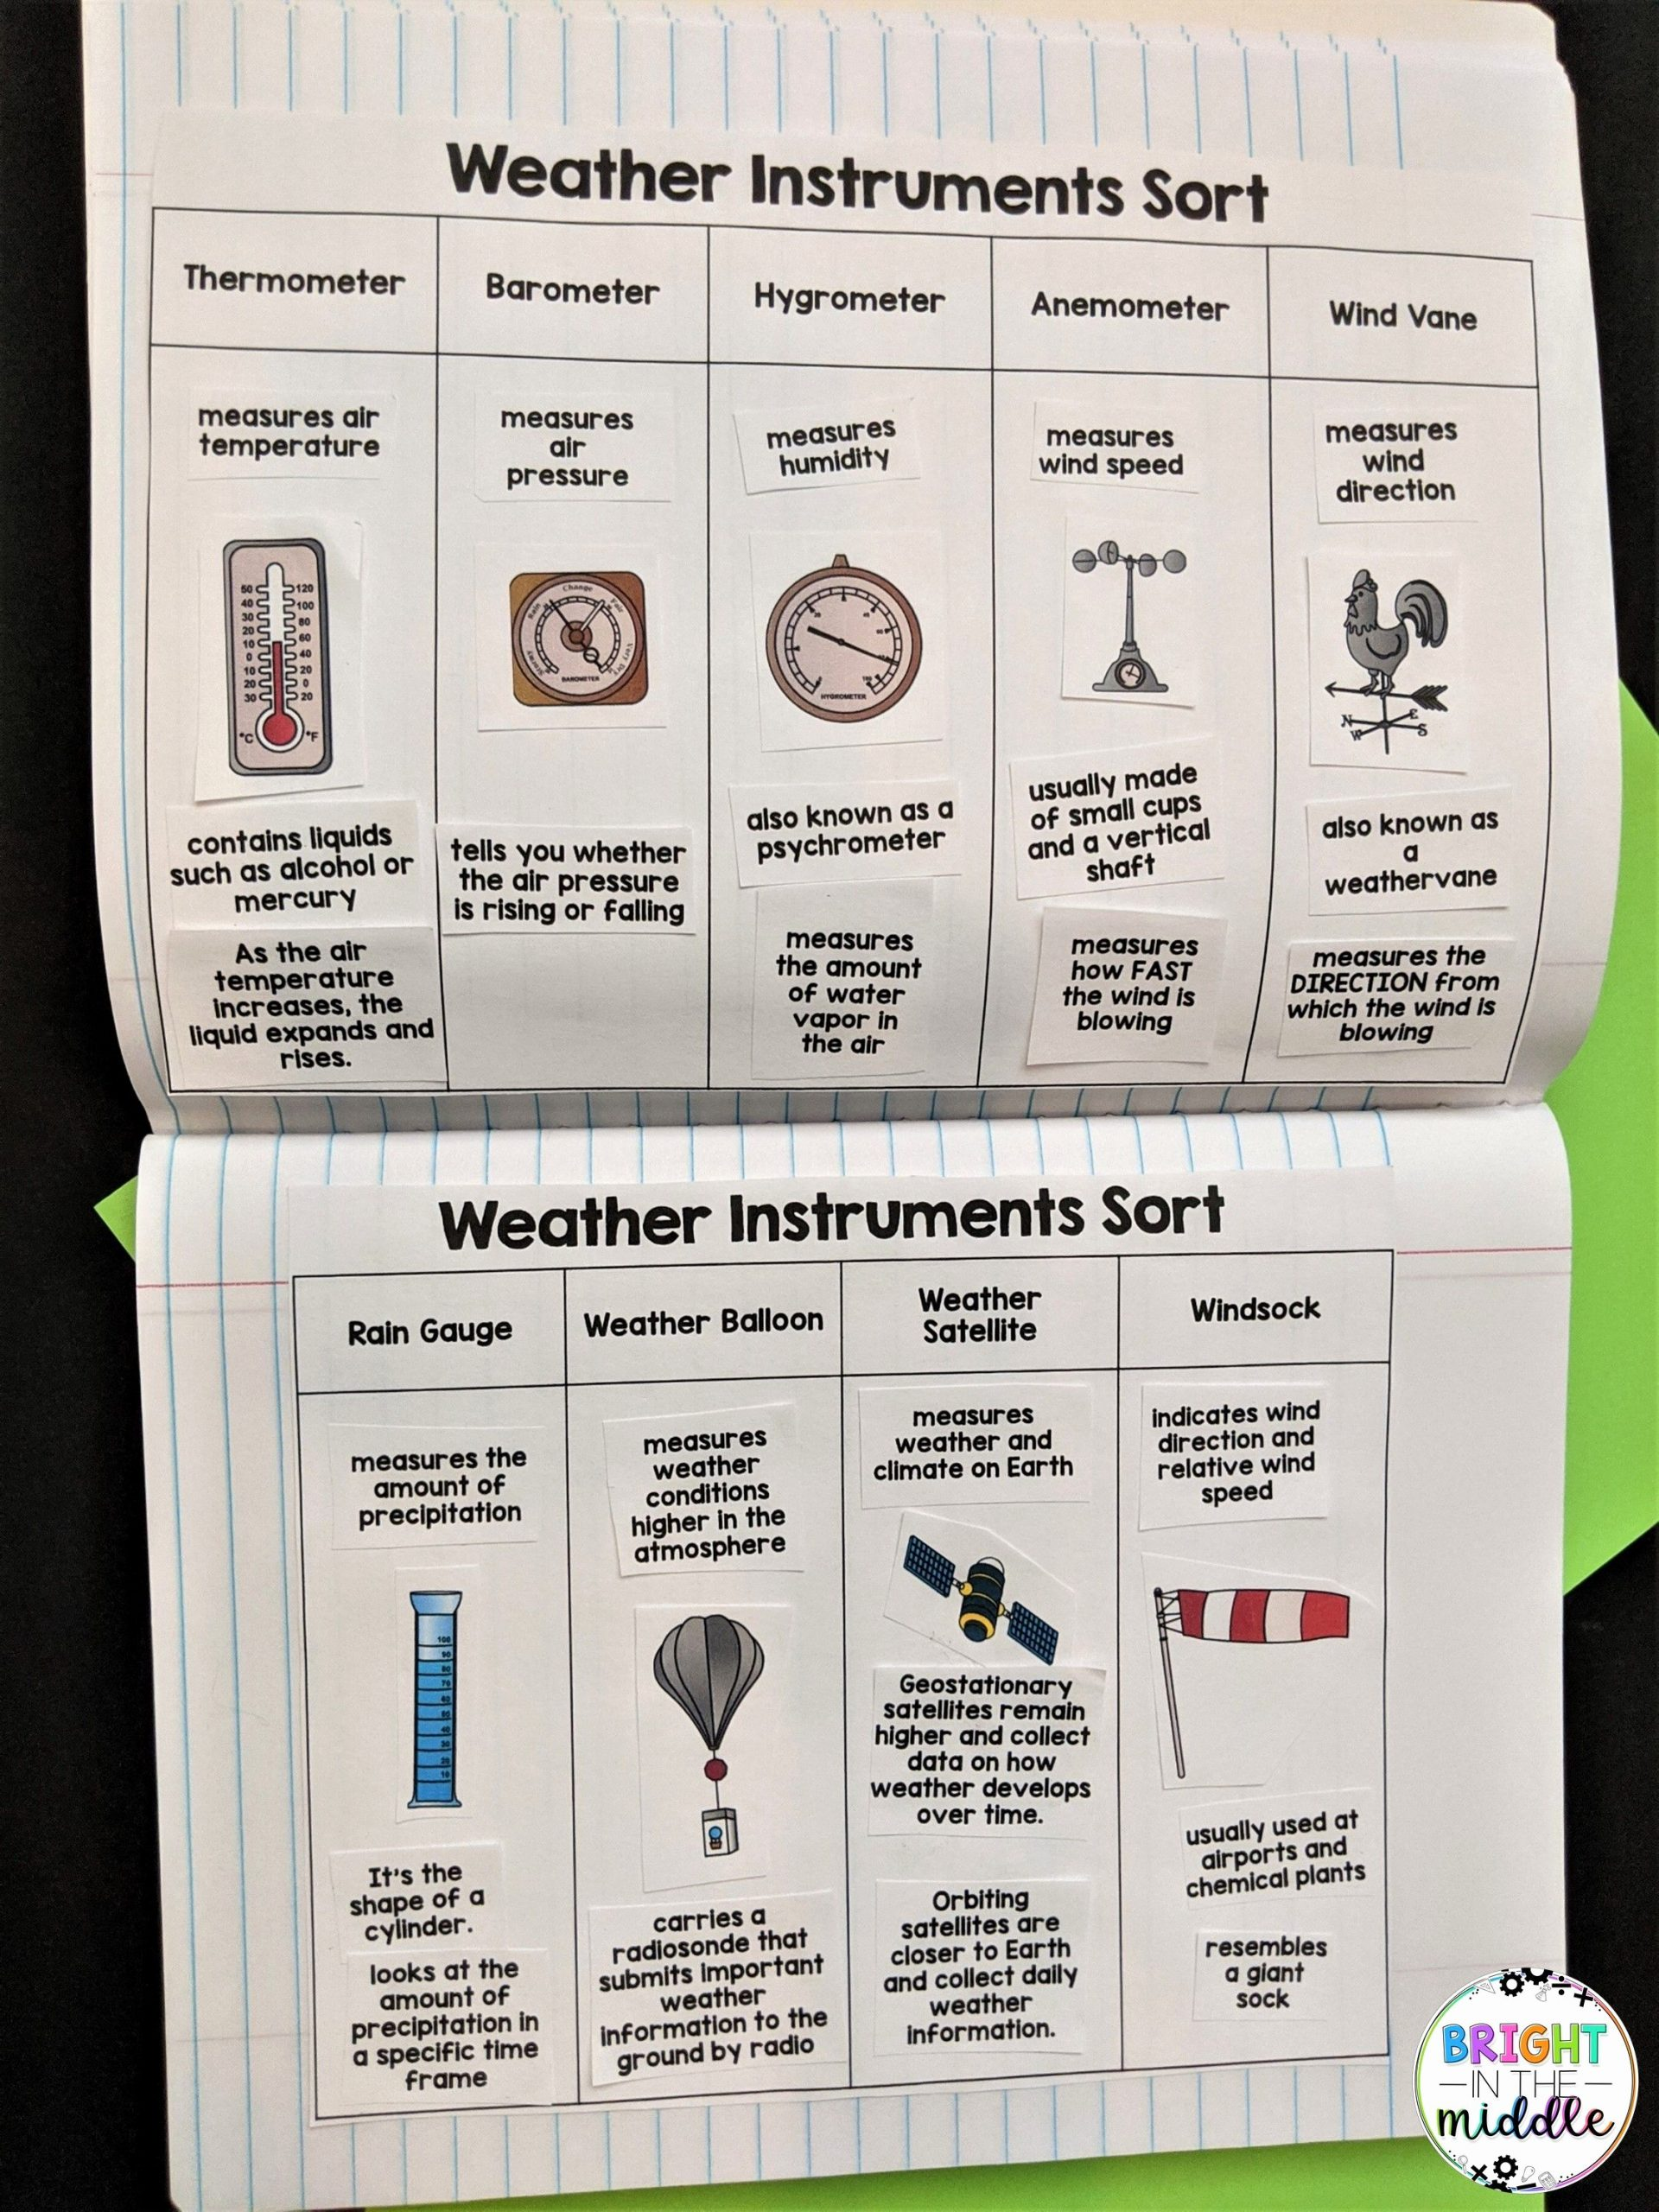 Weather tools Worksheet Inspirational Weather Instruments Worksheet sorting Activity In 2020